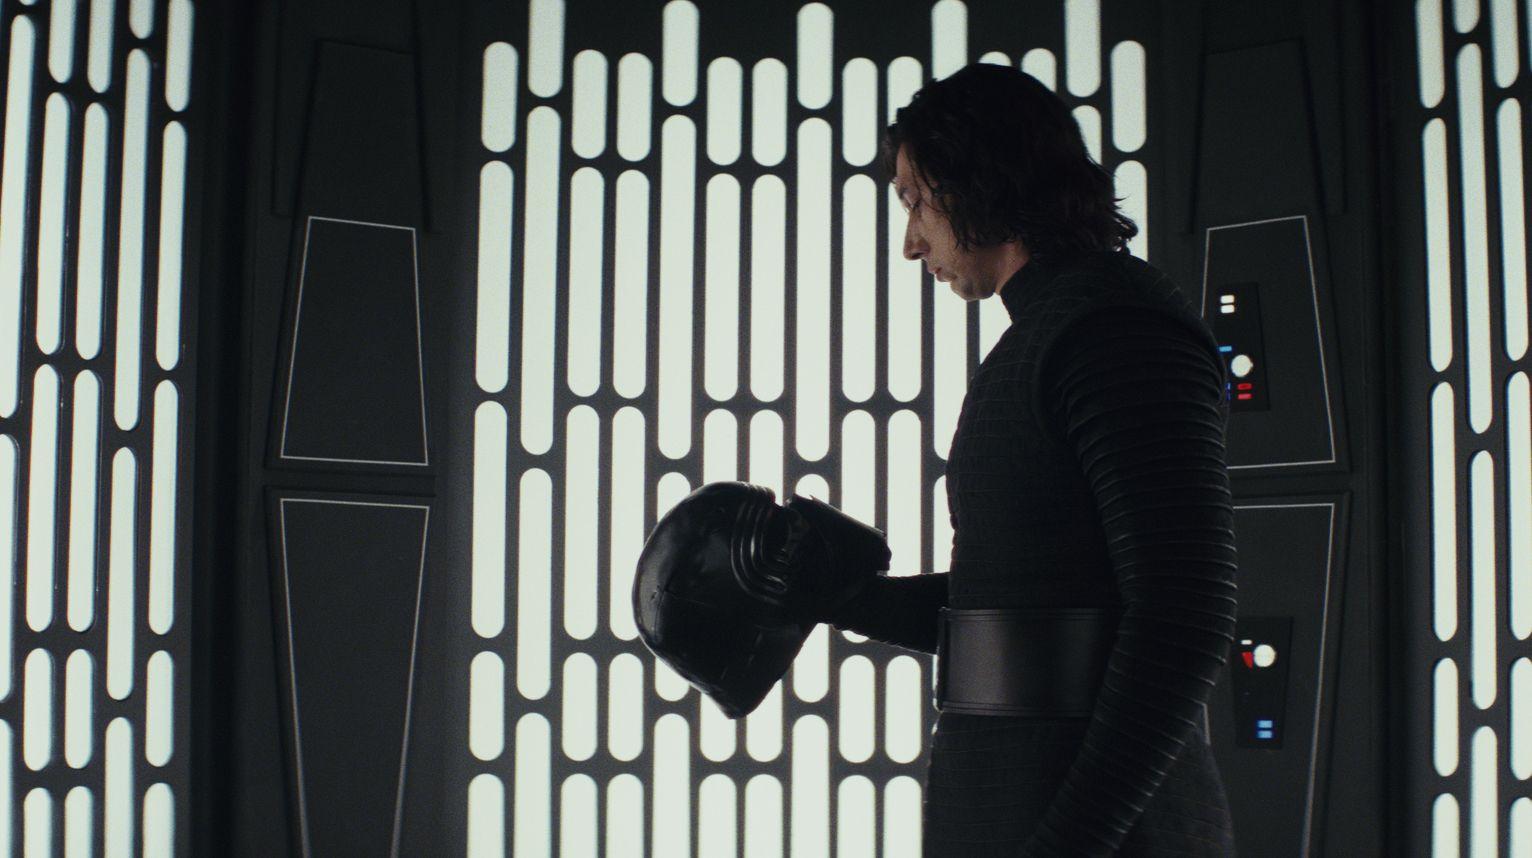 TheLastJedi-star-wars-kylo-ren